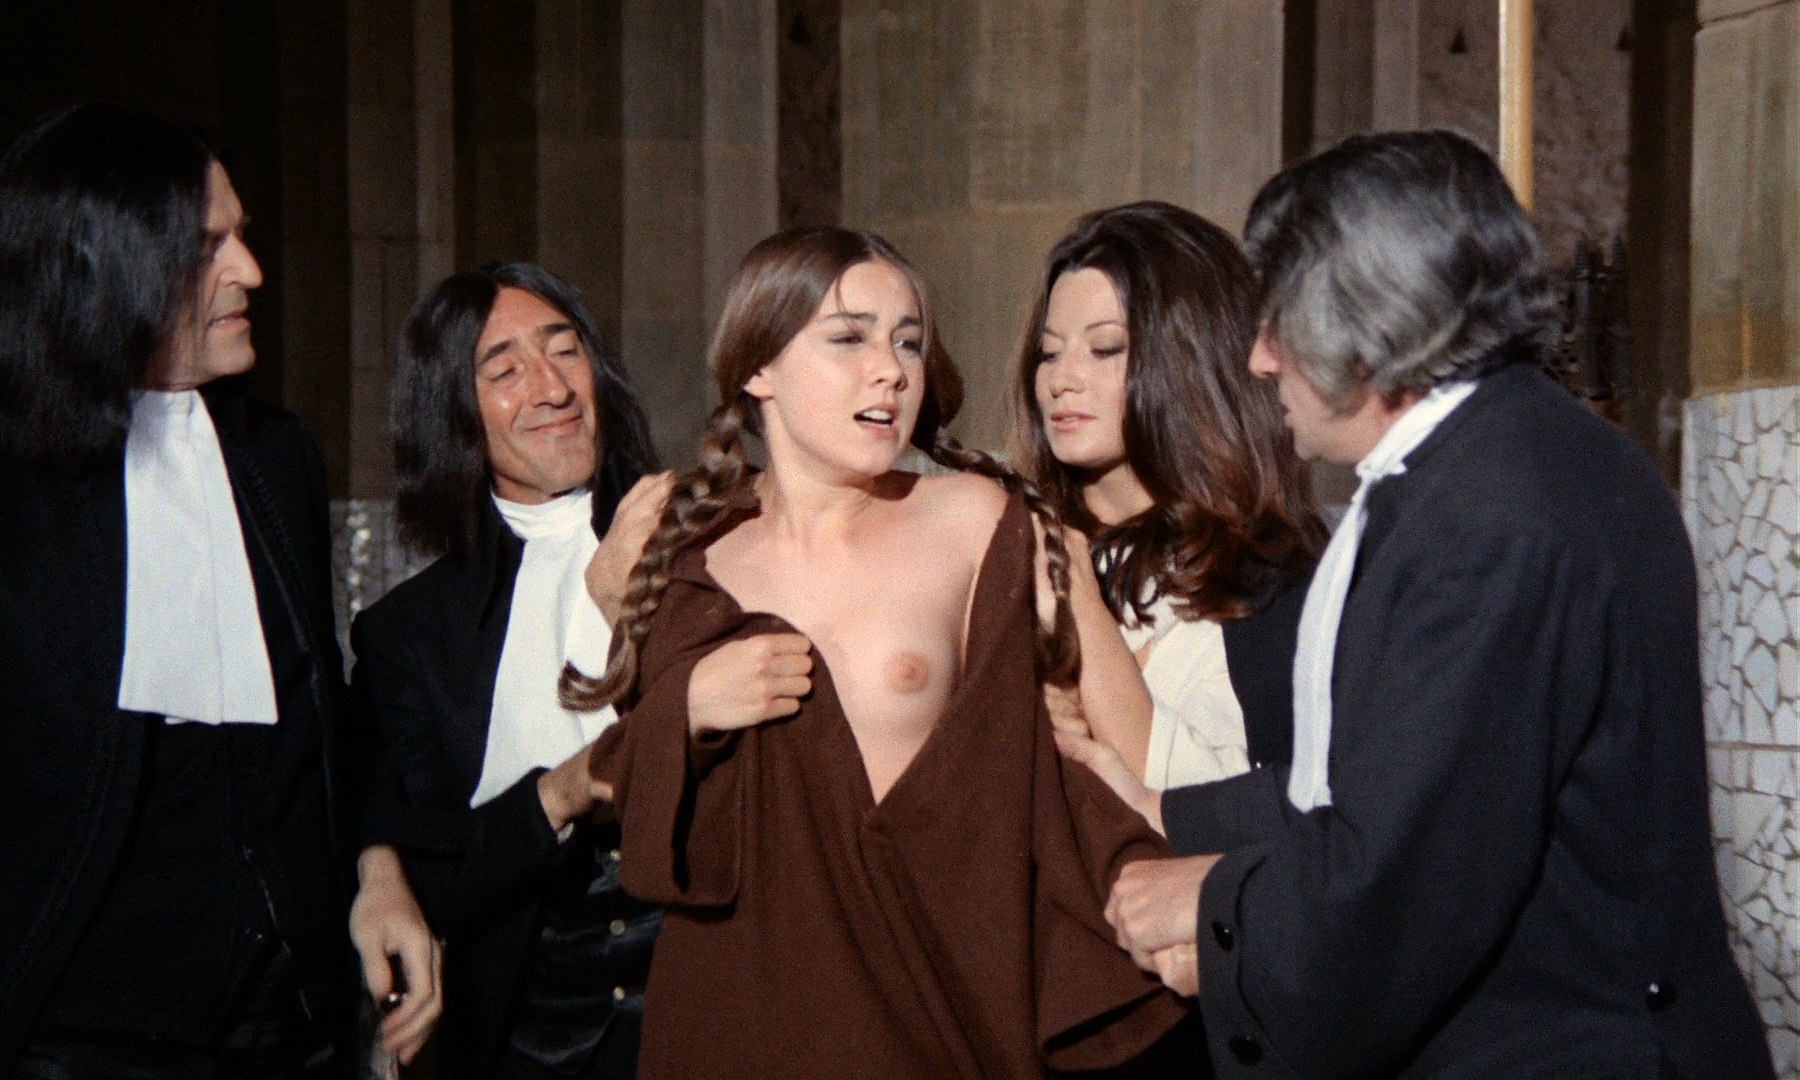 Romina Power nude toplees, Sylva Koscina nude Rosemary Dexter and Maria Rohm nude bush - Marquis de Sade - Justine (IT-1969) HD 1080p BluRay (10)